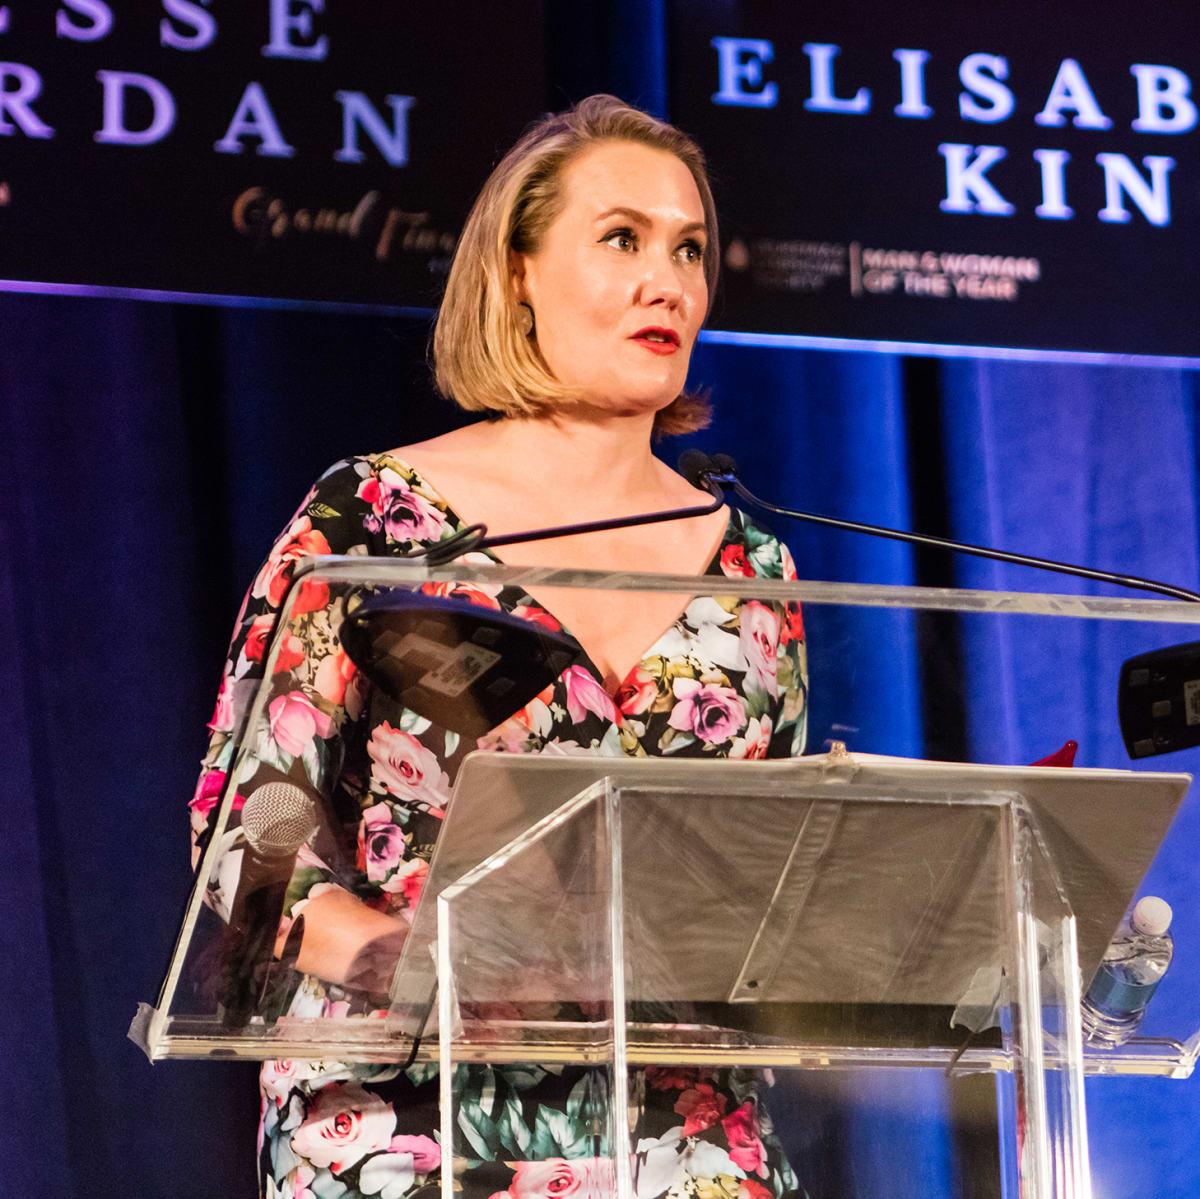 Leukemia & Lymphoma Society's Man and Woman of the Year Grand Finale Gala 2017 Anne Idsal